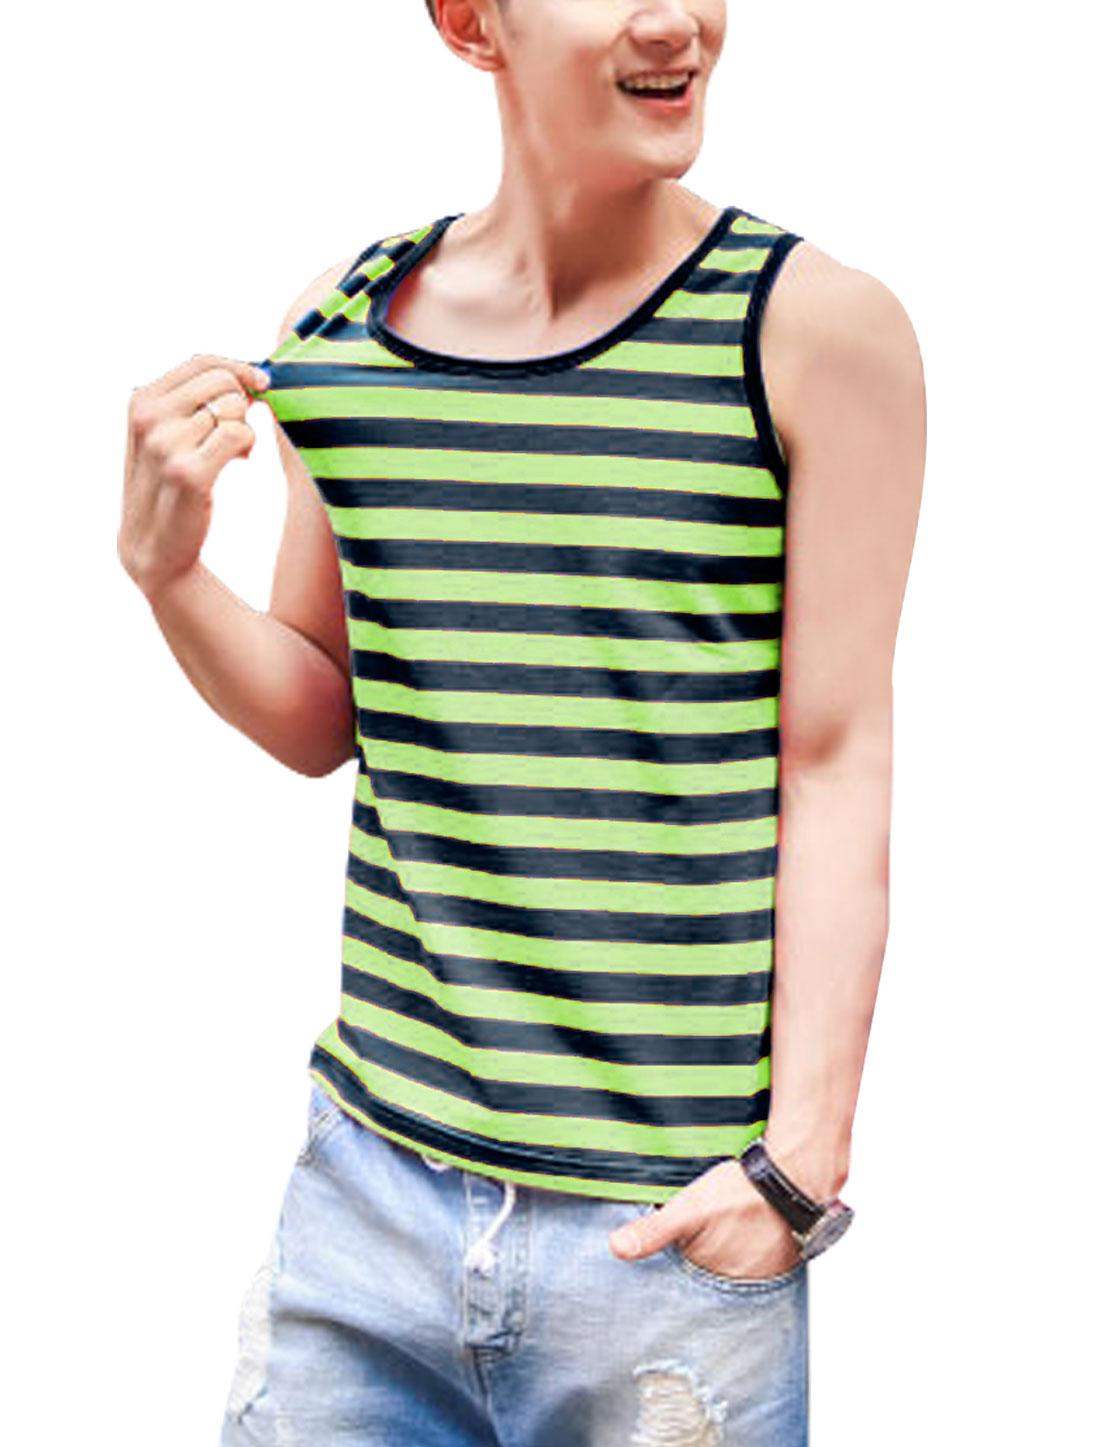 Man Sleeveless Bar Striped Round Neck Pullover Tank Top Green Black M